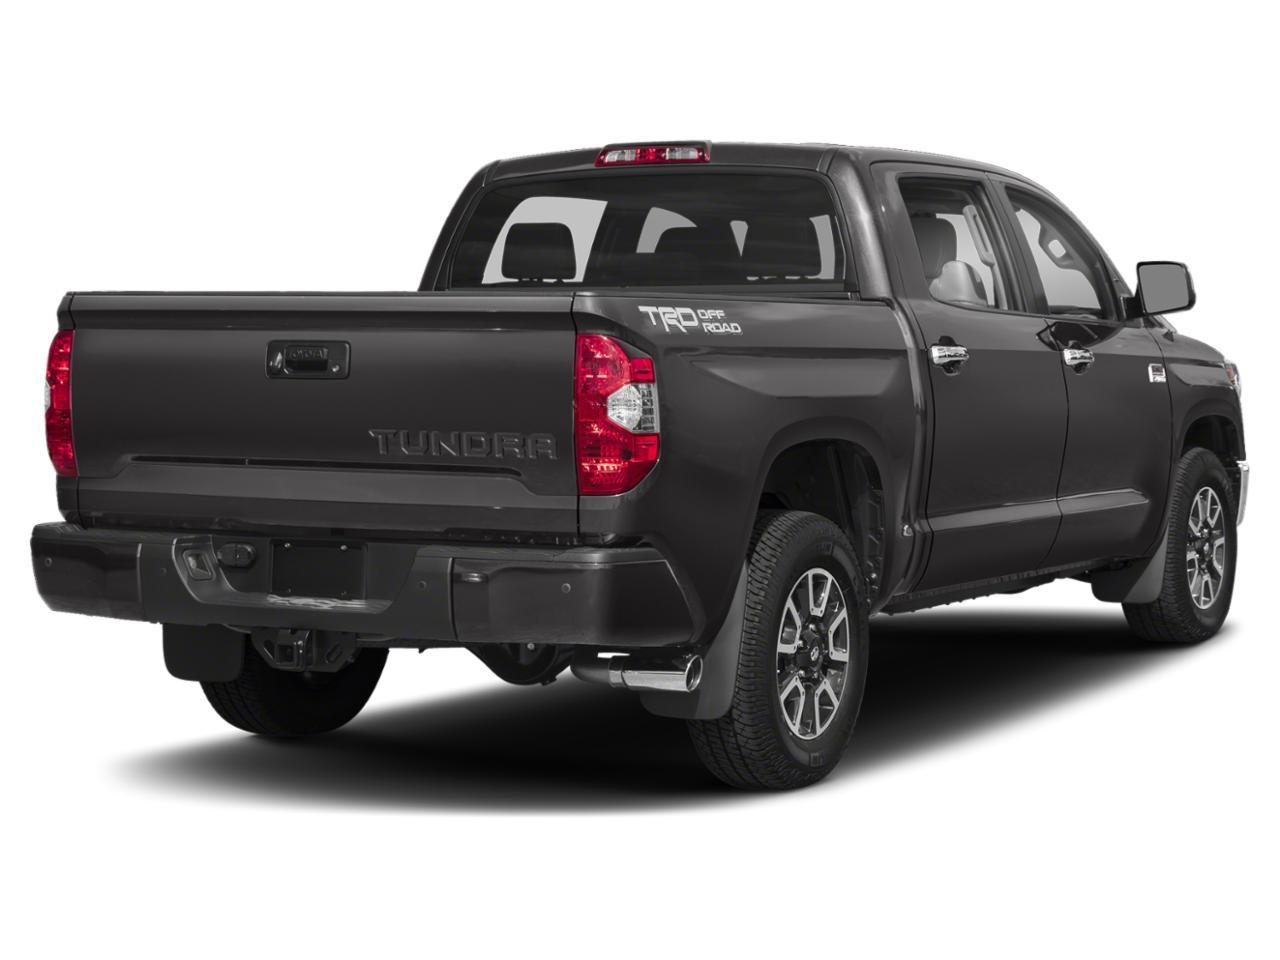 2020 Toyota Tundra 1794 EDITION Crew Cab Pickup Slide